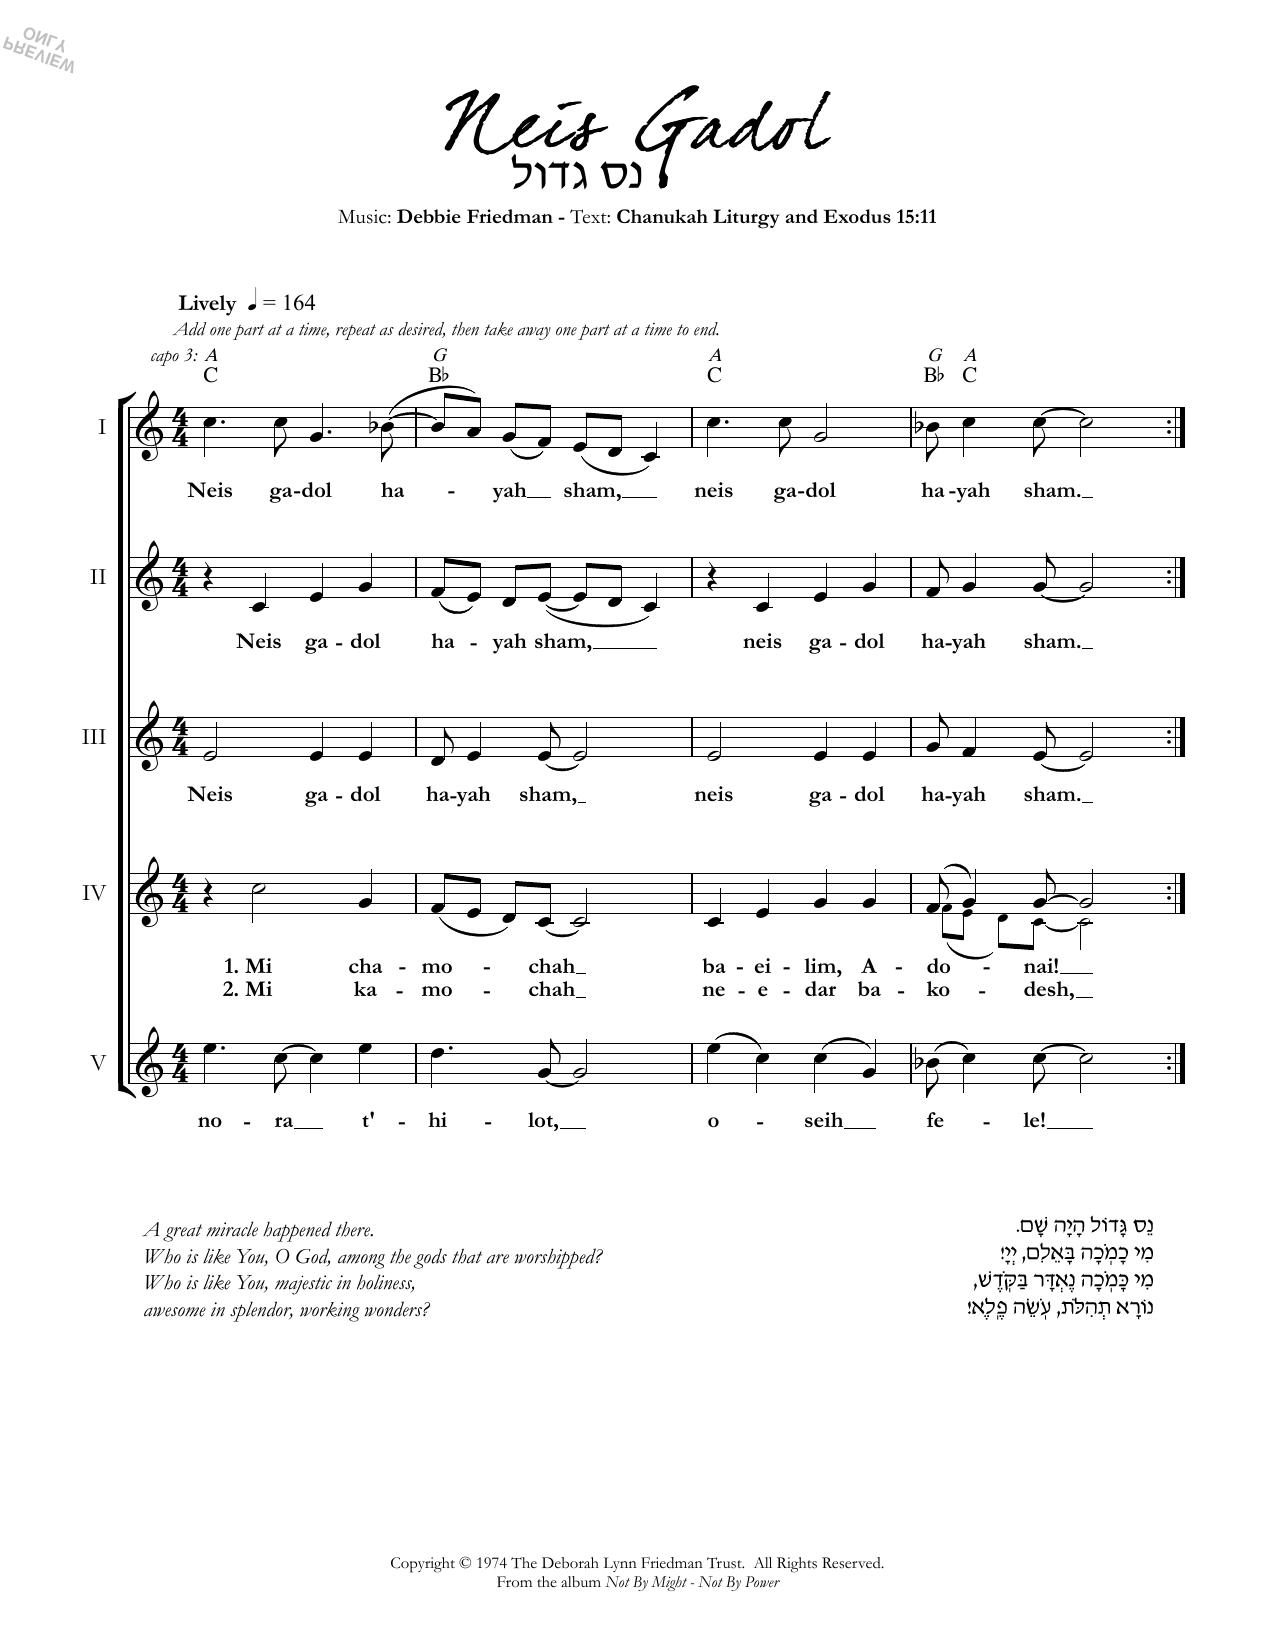 Neis Gadol Sheet Music